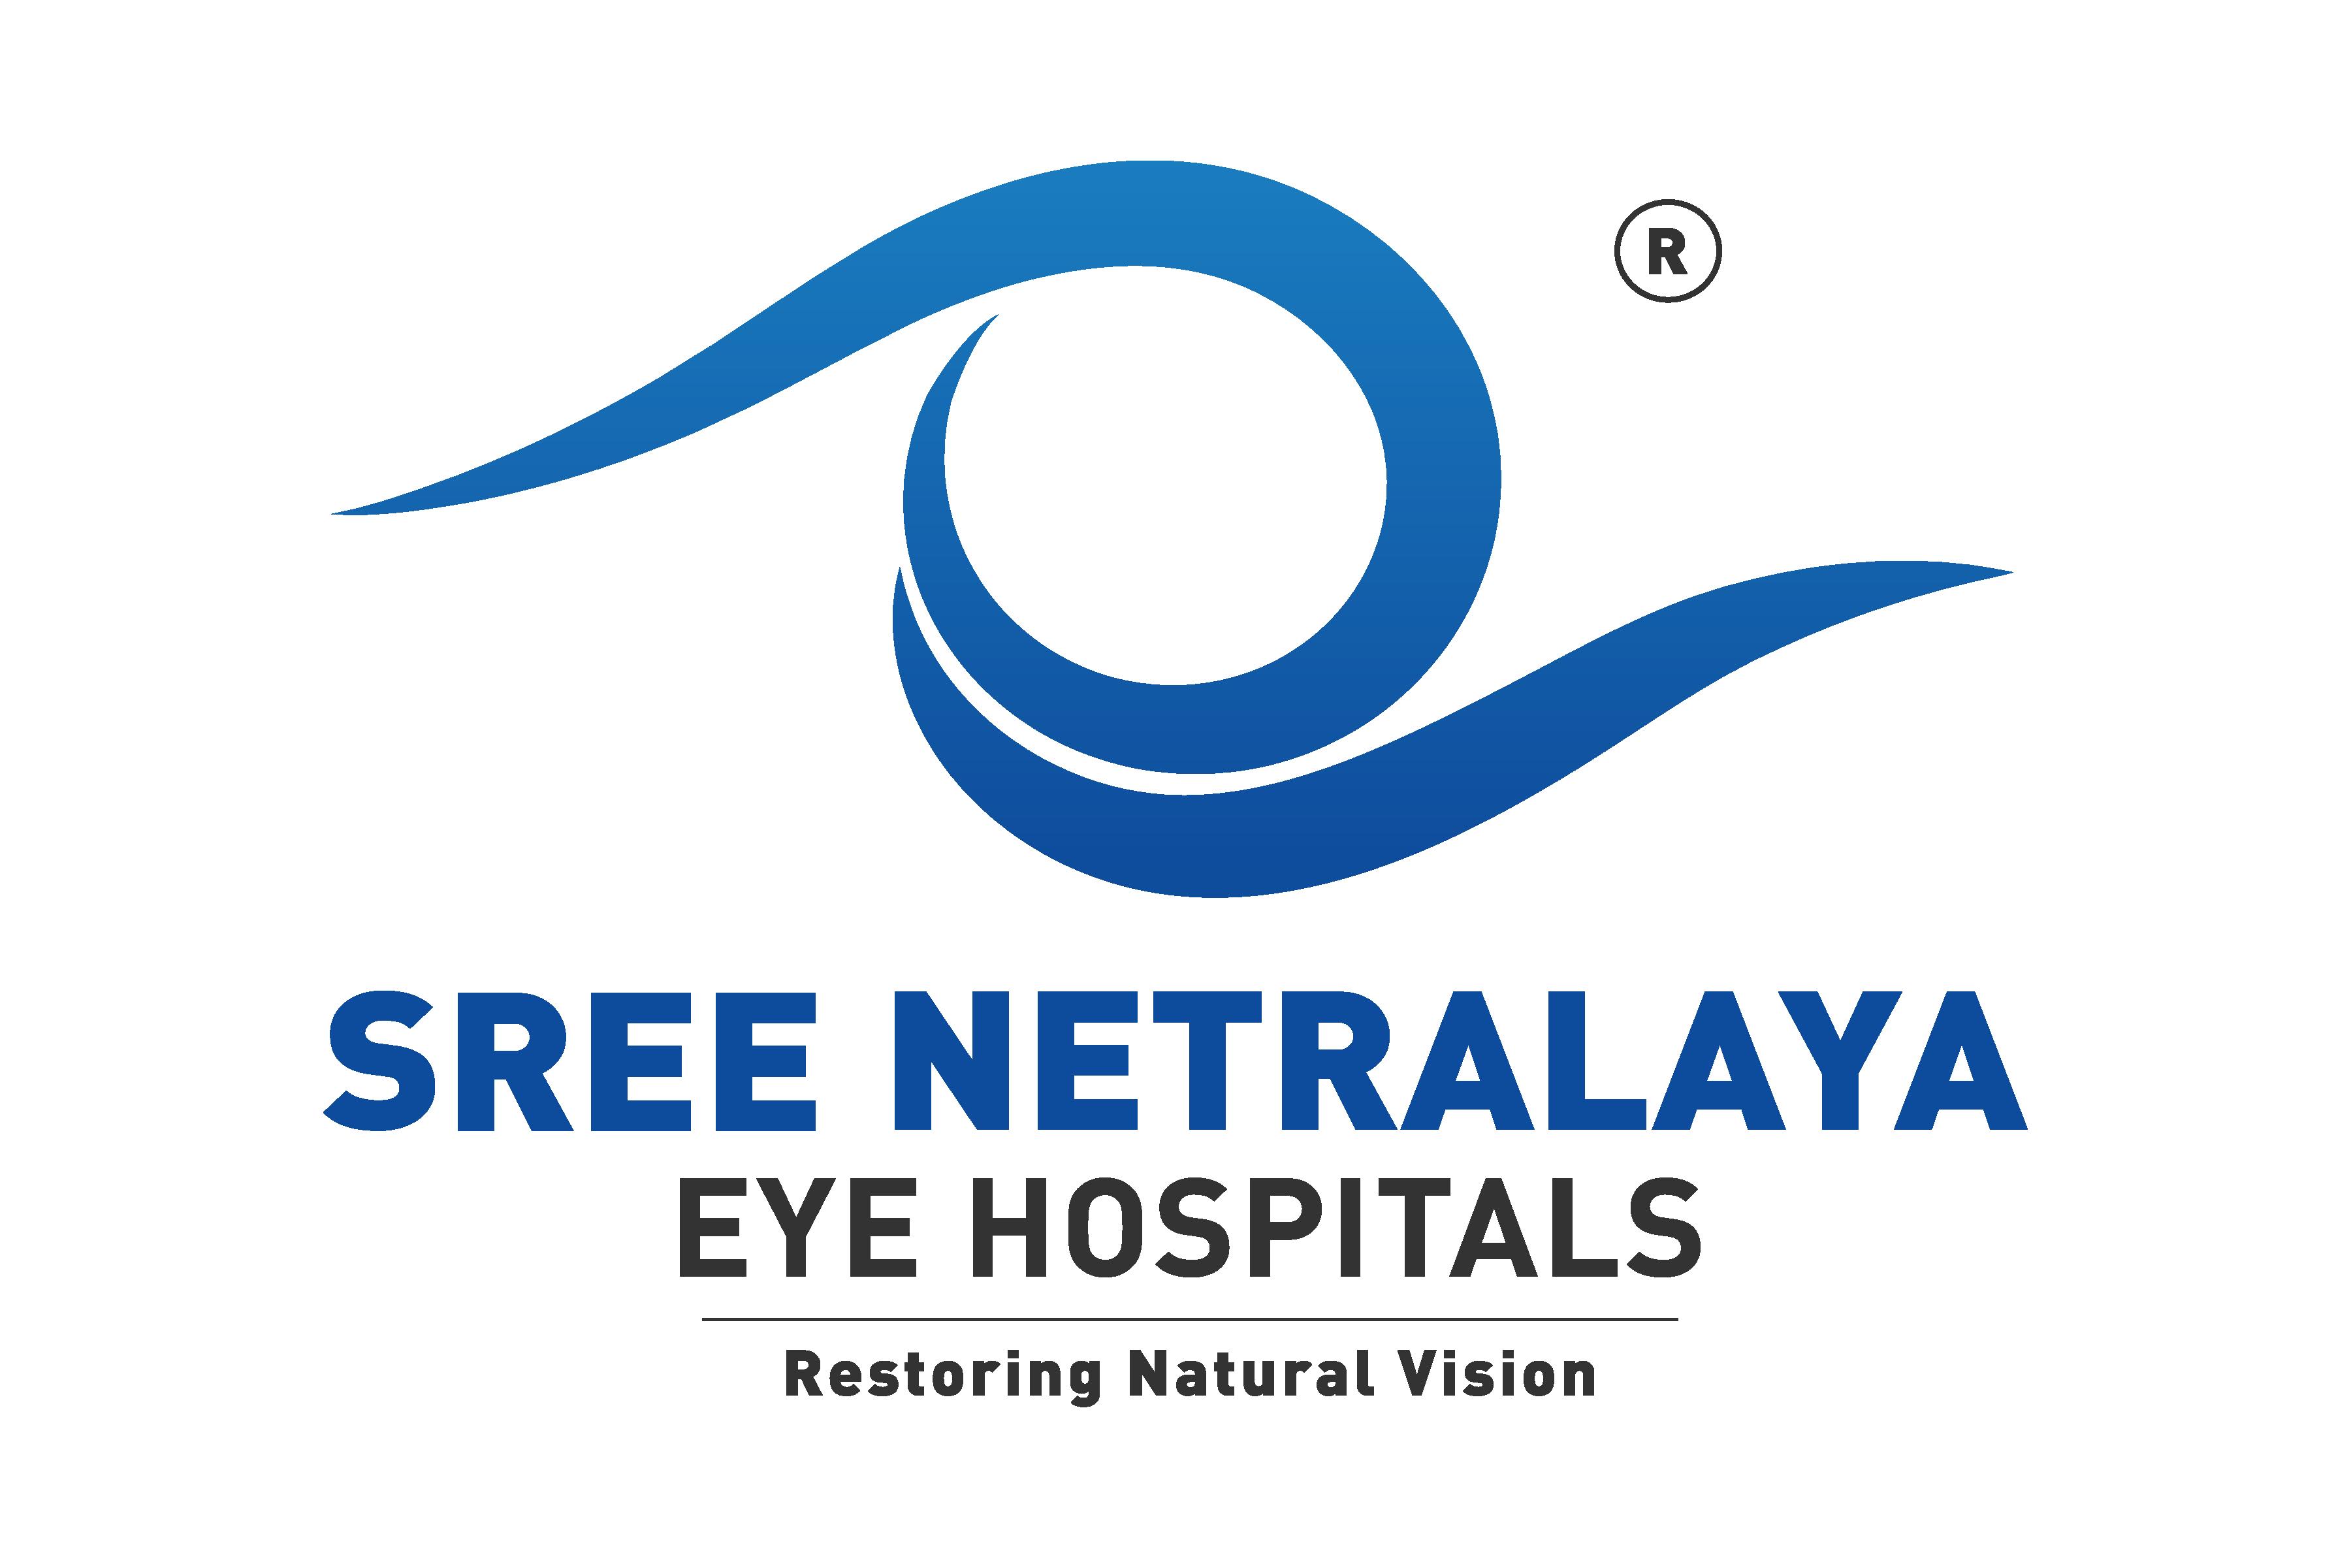 Sree Netralaya Eye Hospitals